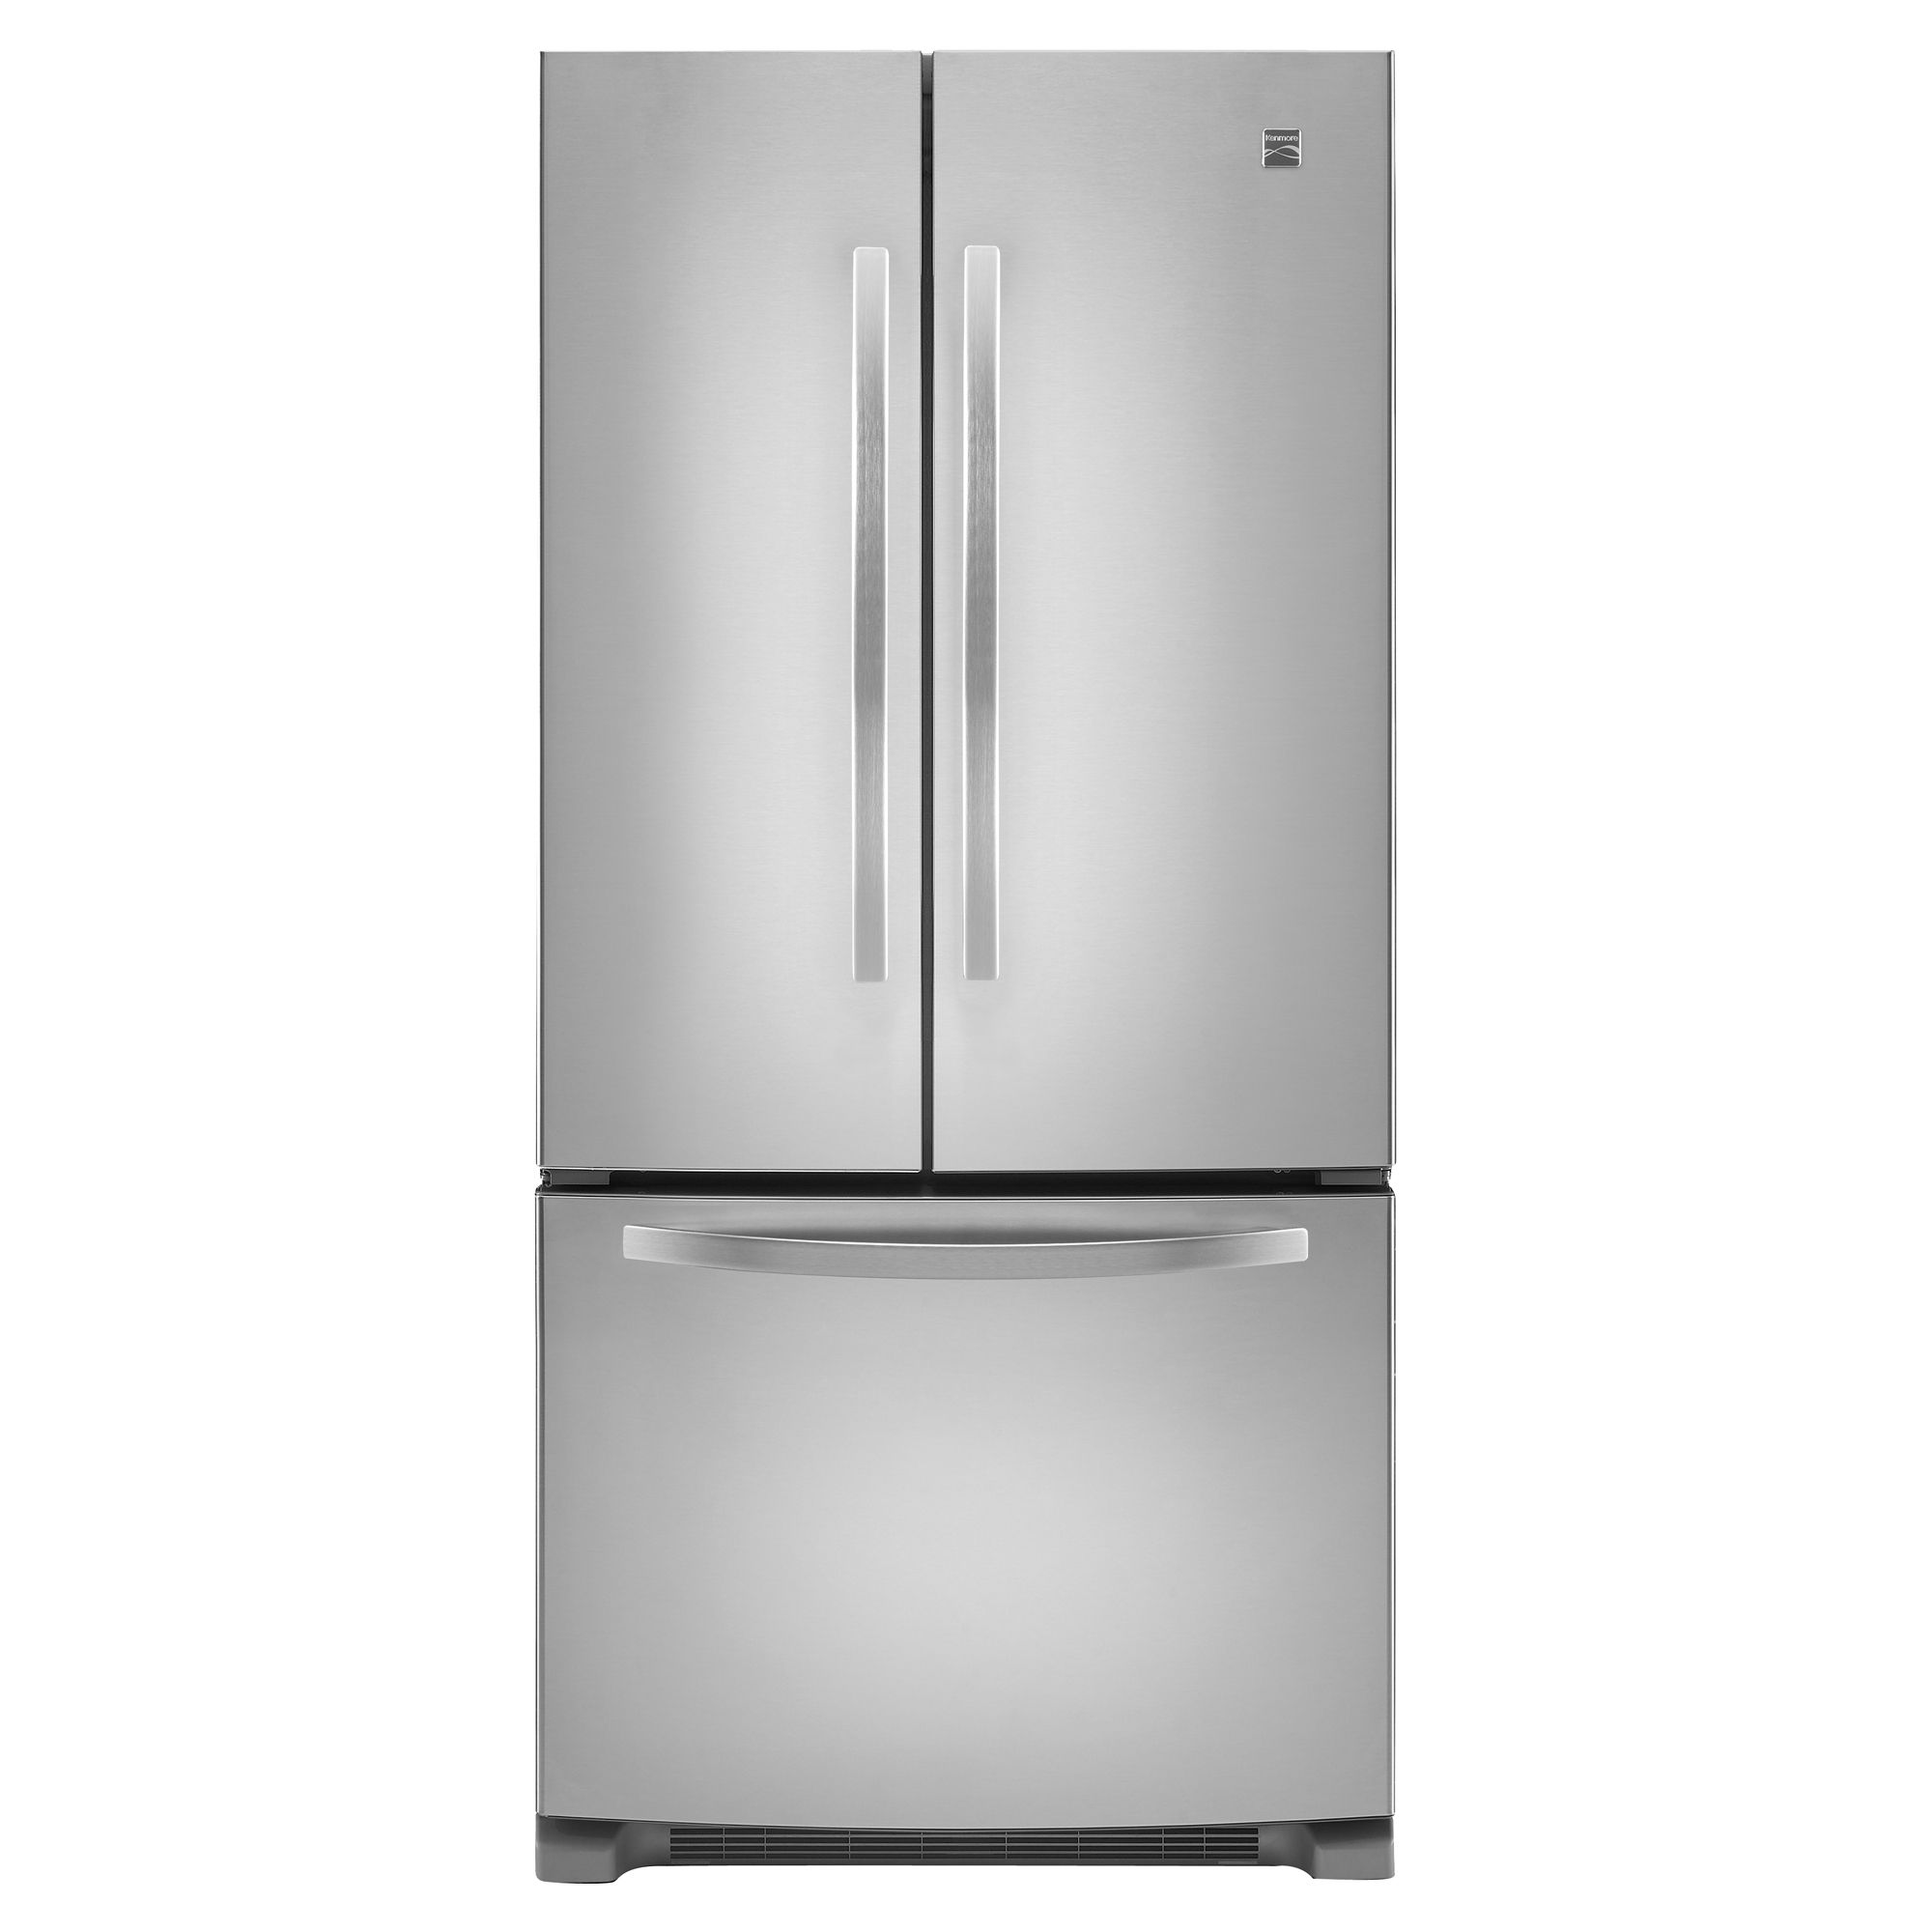 prod_2041914112?wid=200&hei=250 kenmore model 106 refrigerator the best refrigerator 2017 kenmore coldspot 106 wiring diagram at suagrazia.org